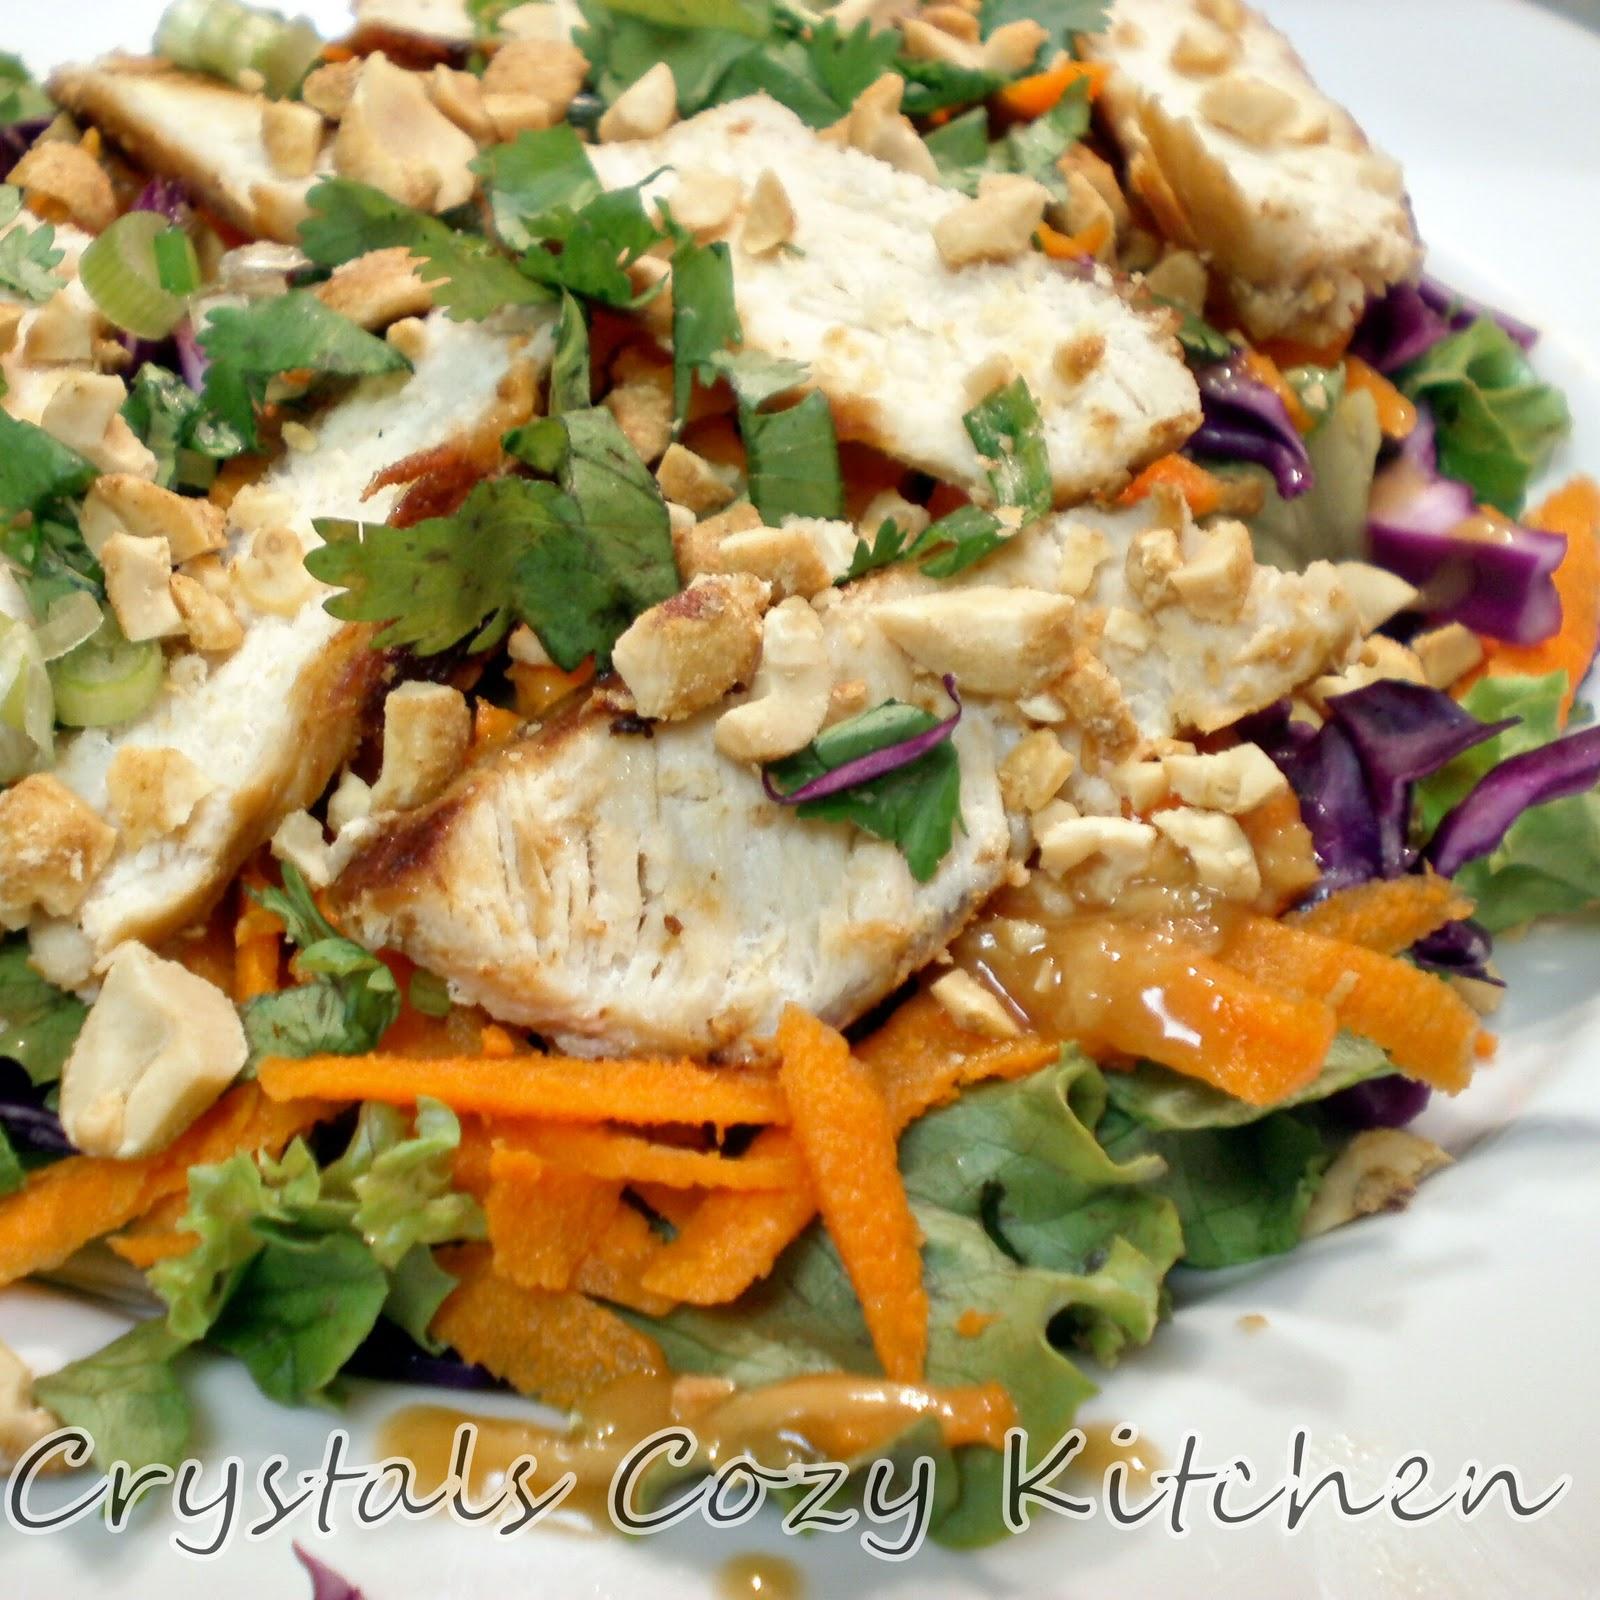 Crystal's Cozy Kitchen: Chinese Chicken Salad